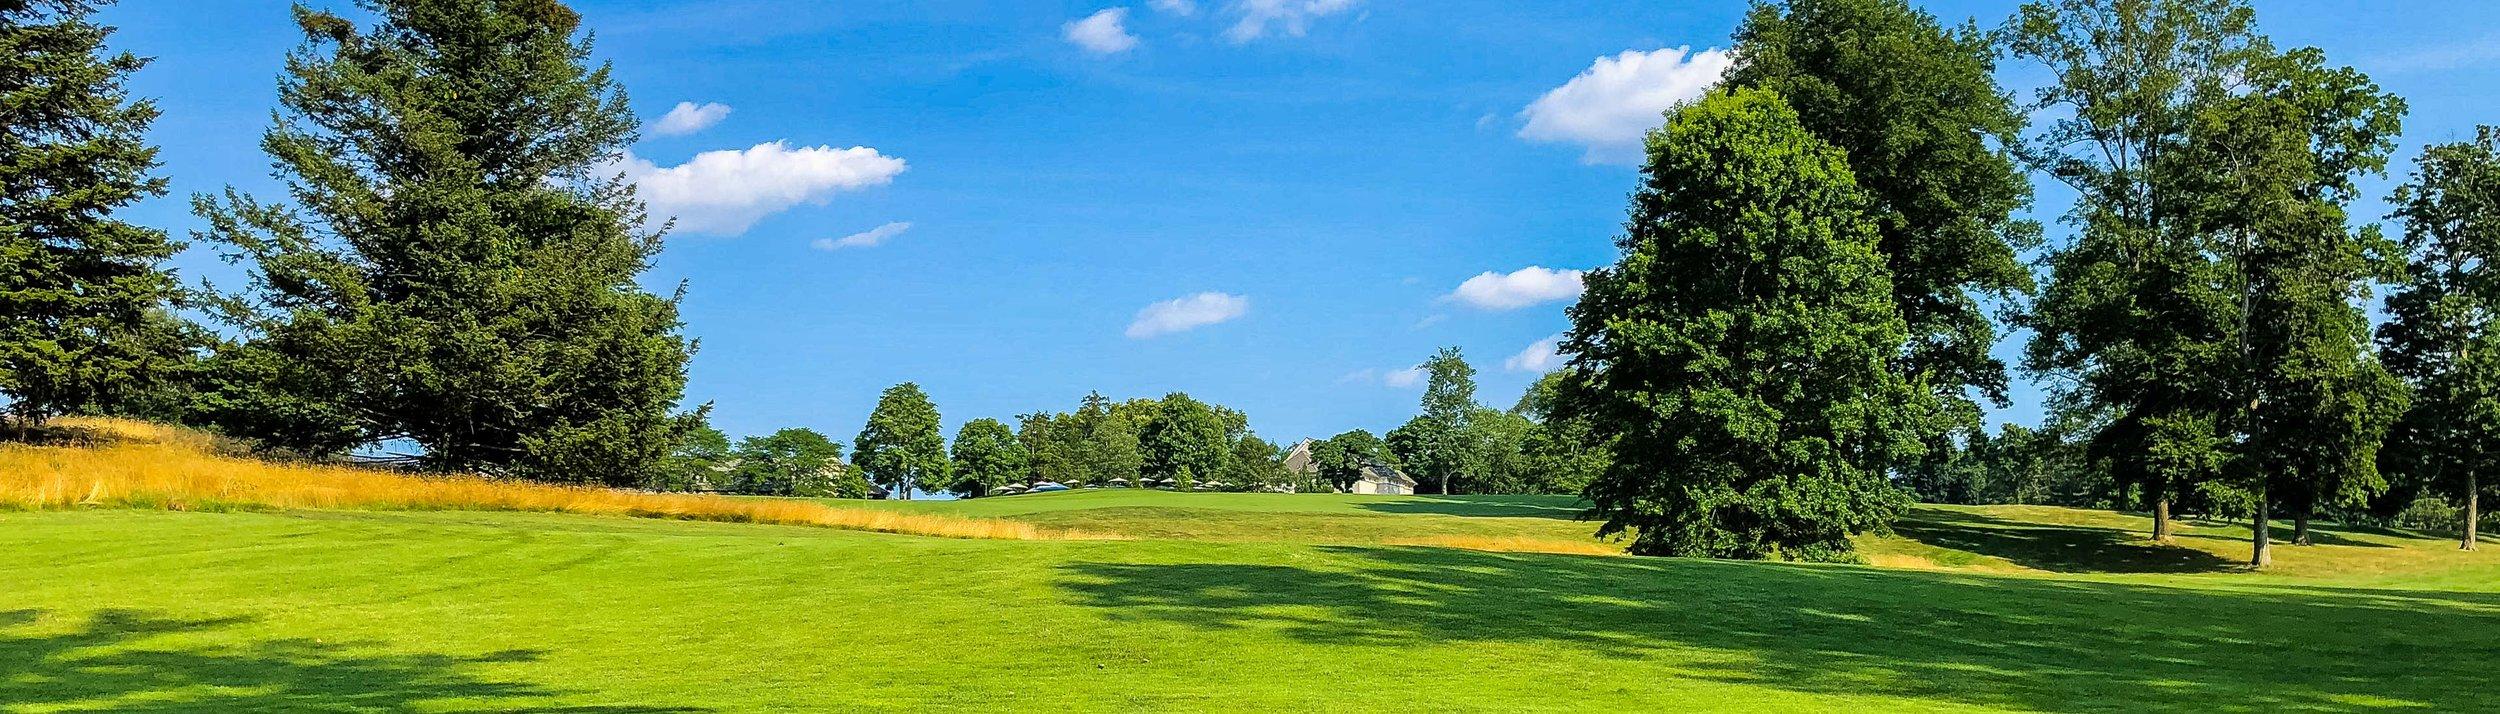 SCC 2018 Golf #14 & 15- HAP (4 of 20).jpg